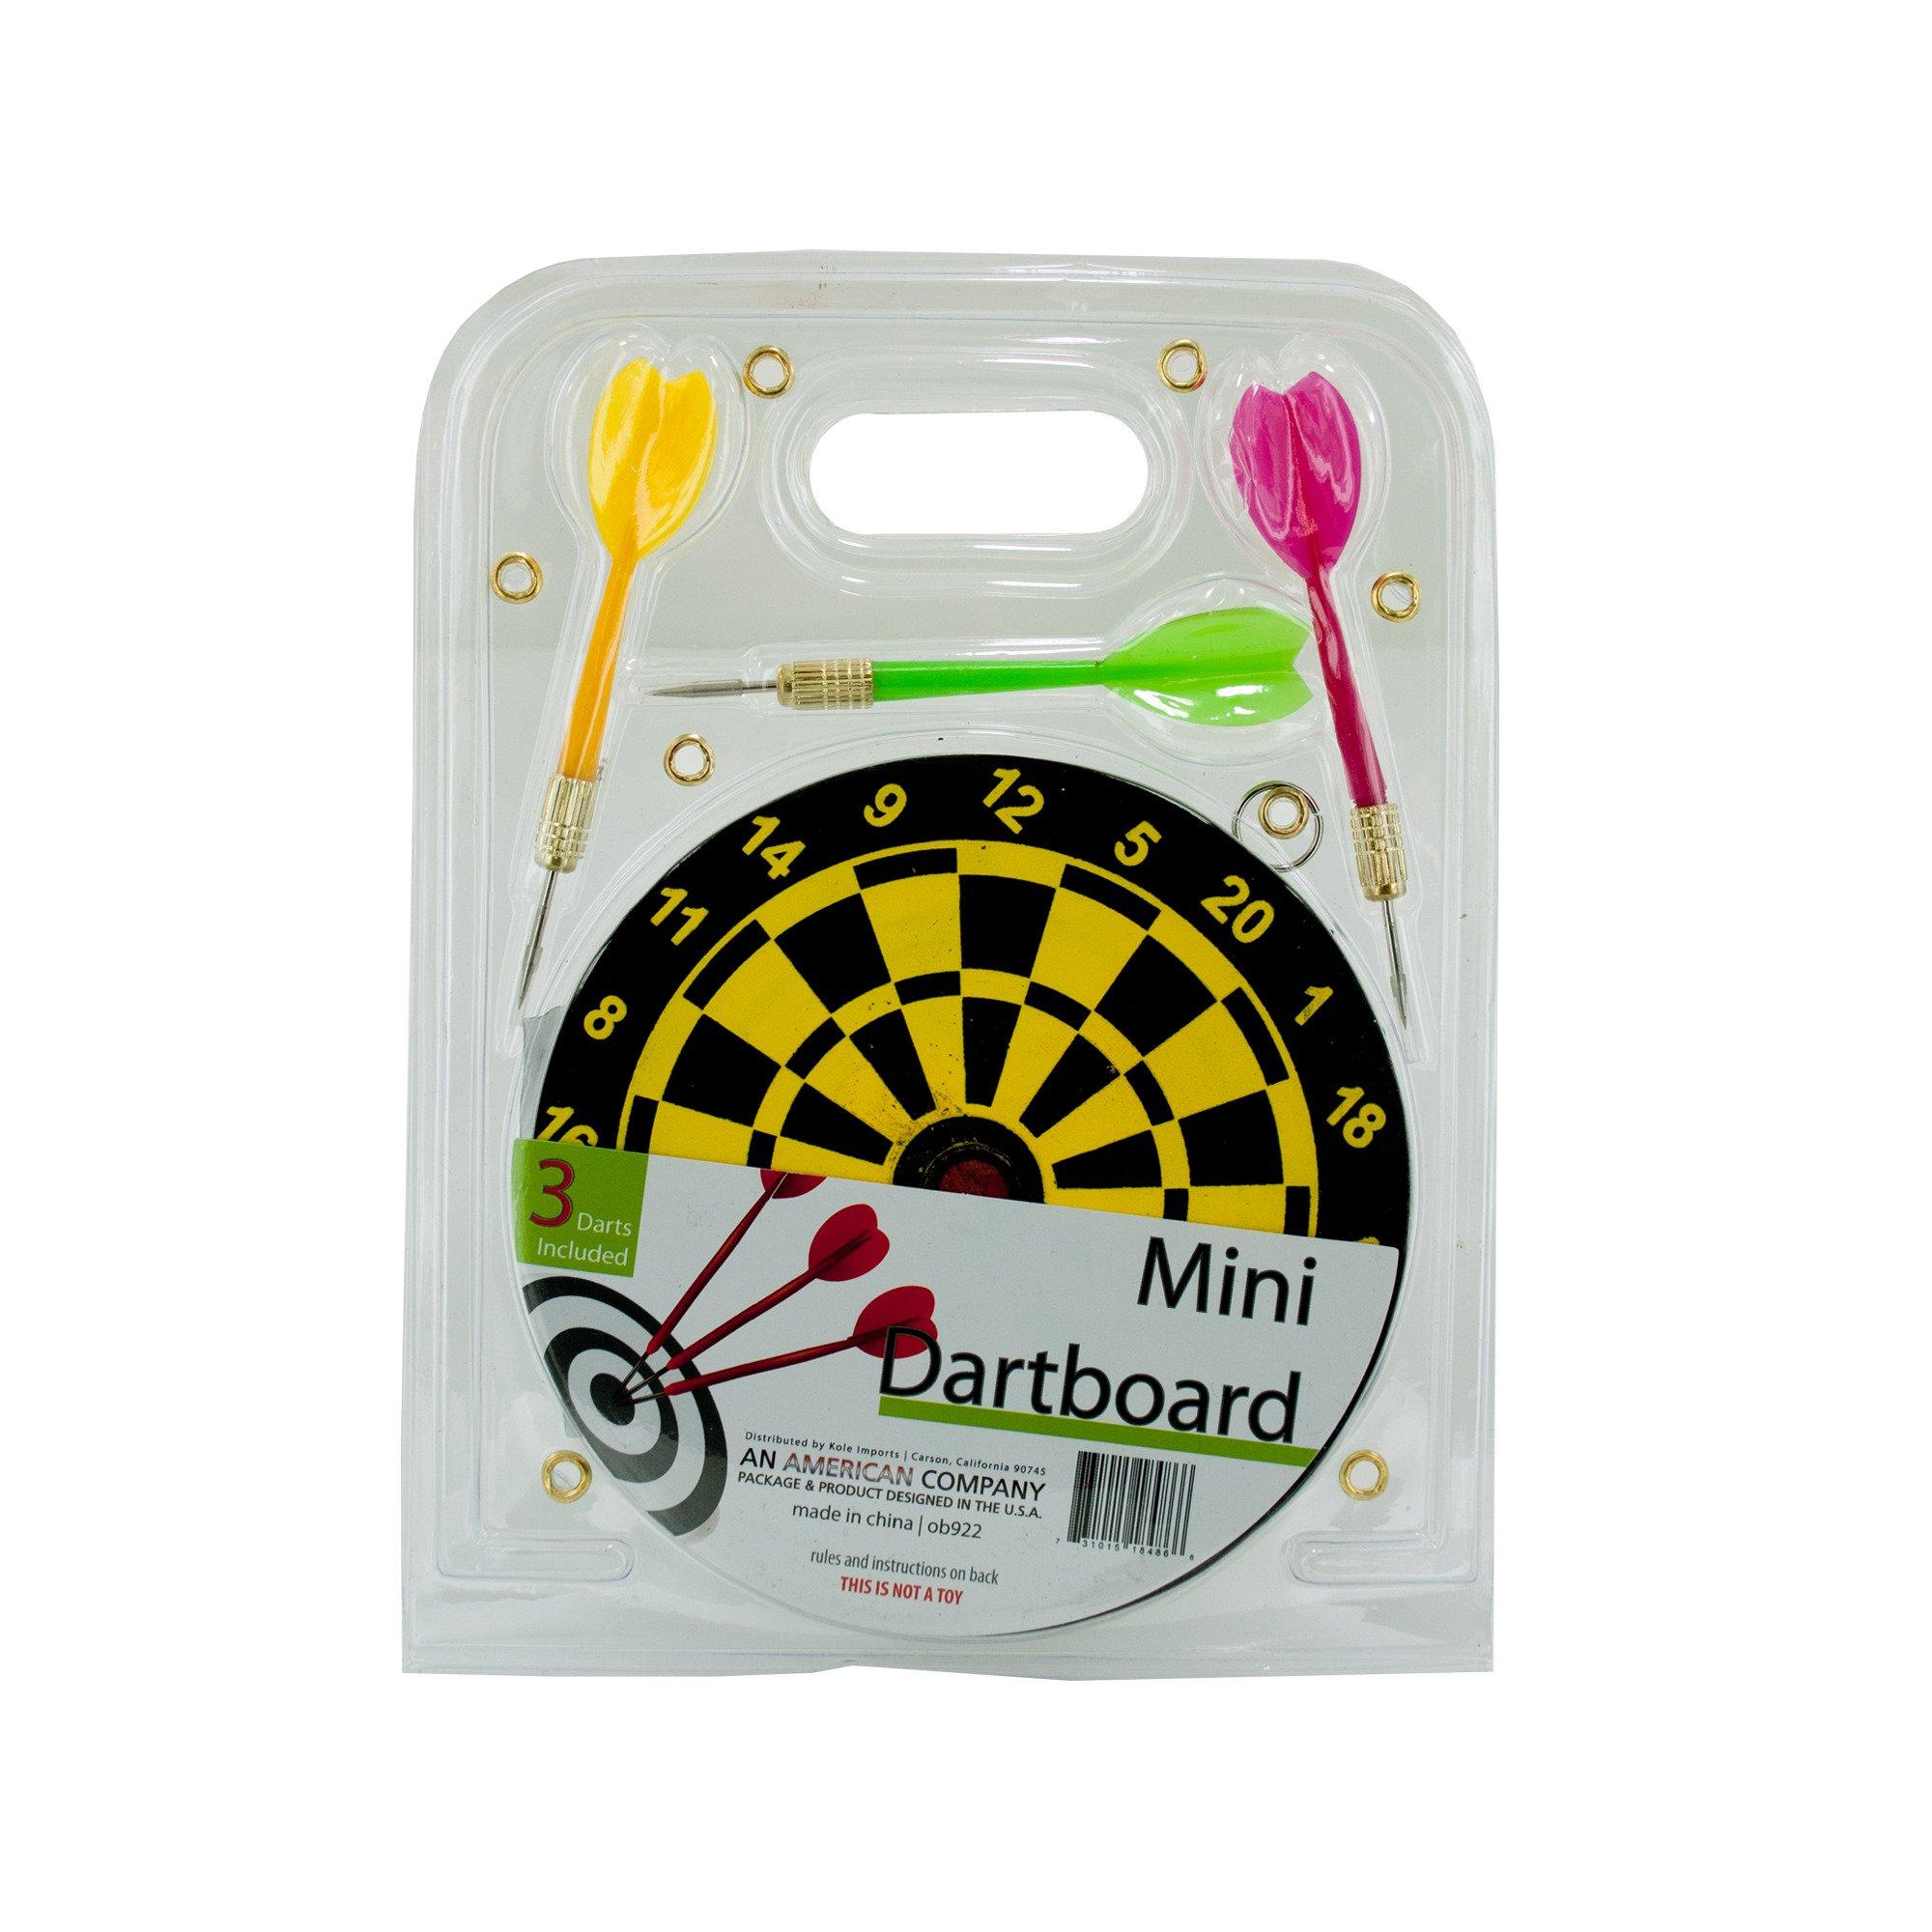 123-Wholesale - Set of 24 Mini Dartboard Set - Games Kids Games